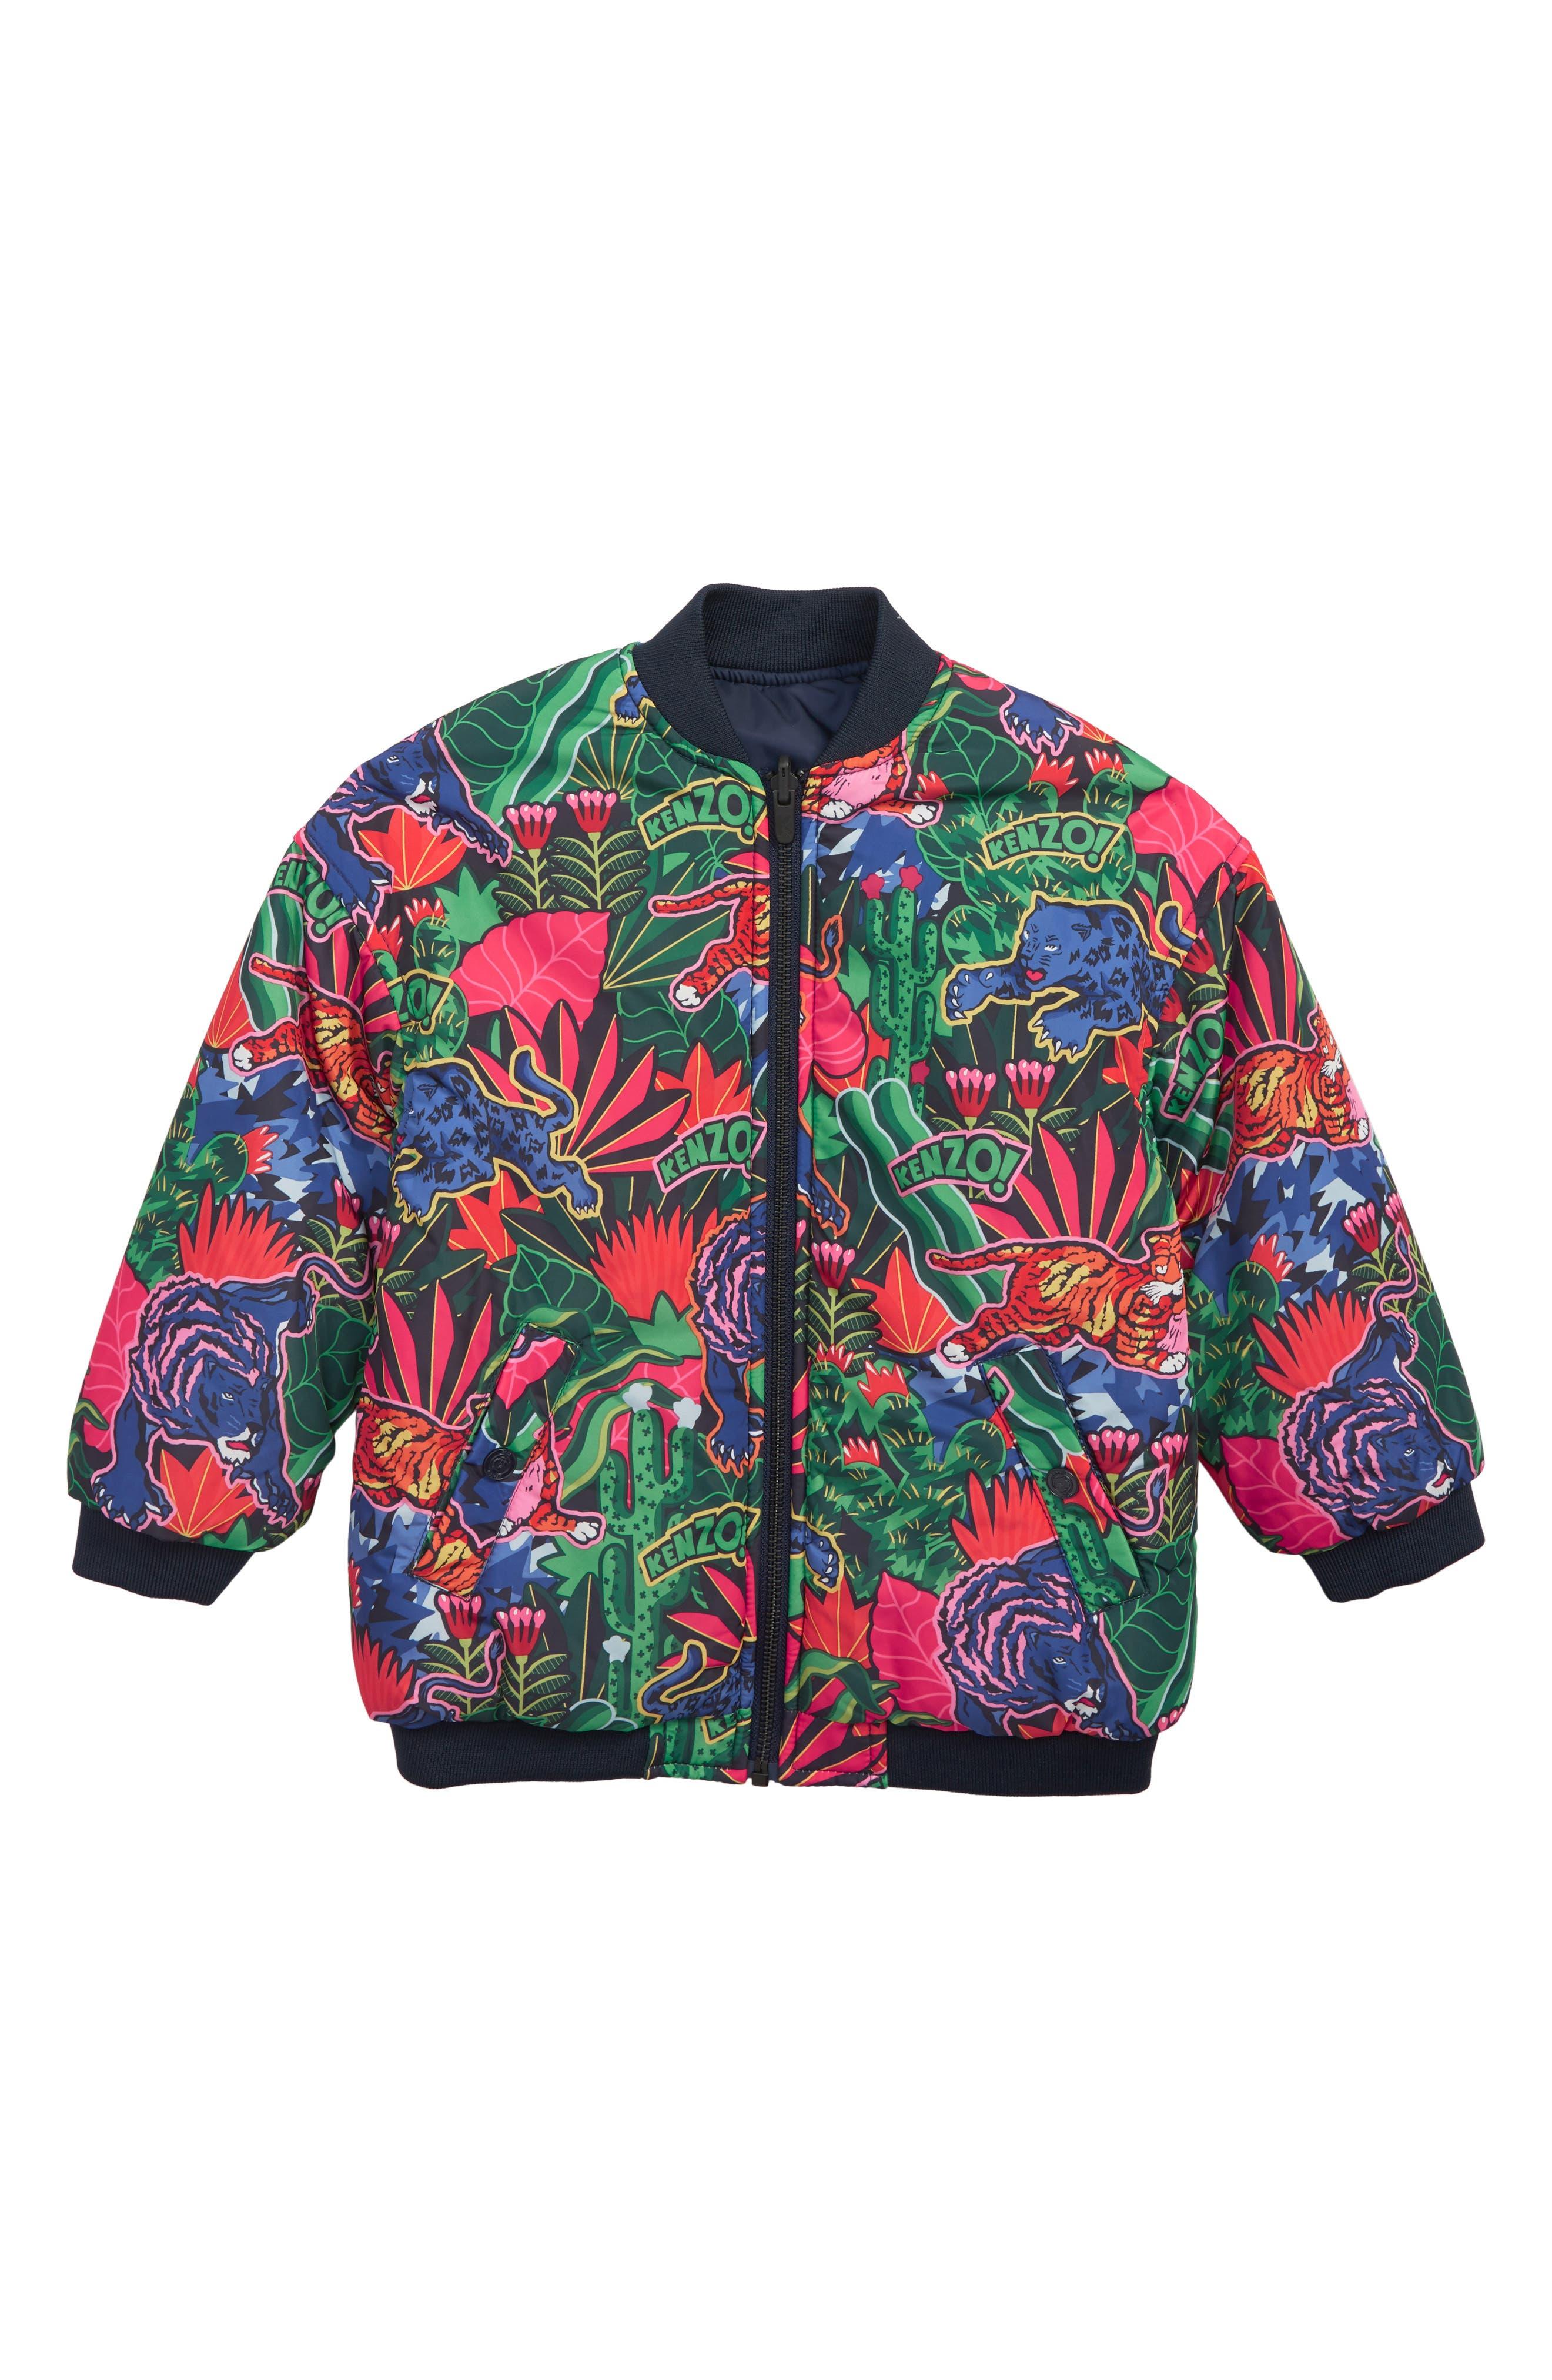 KENZO, Reversible Puffer Jacket, Main thumbnail 1, color, NAVY